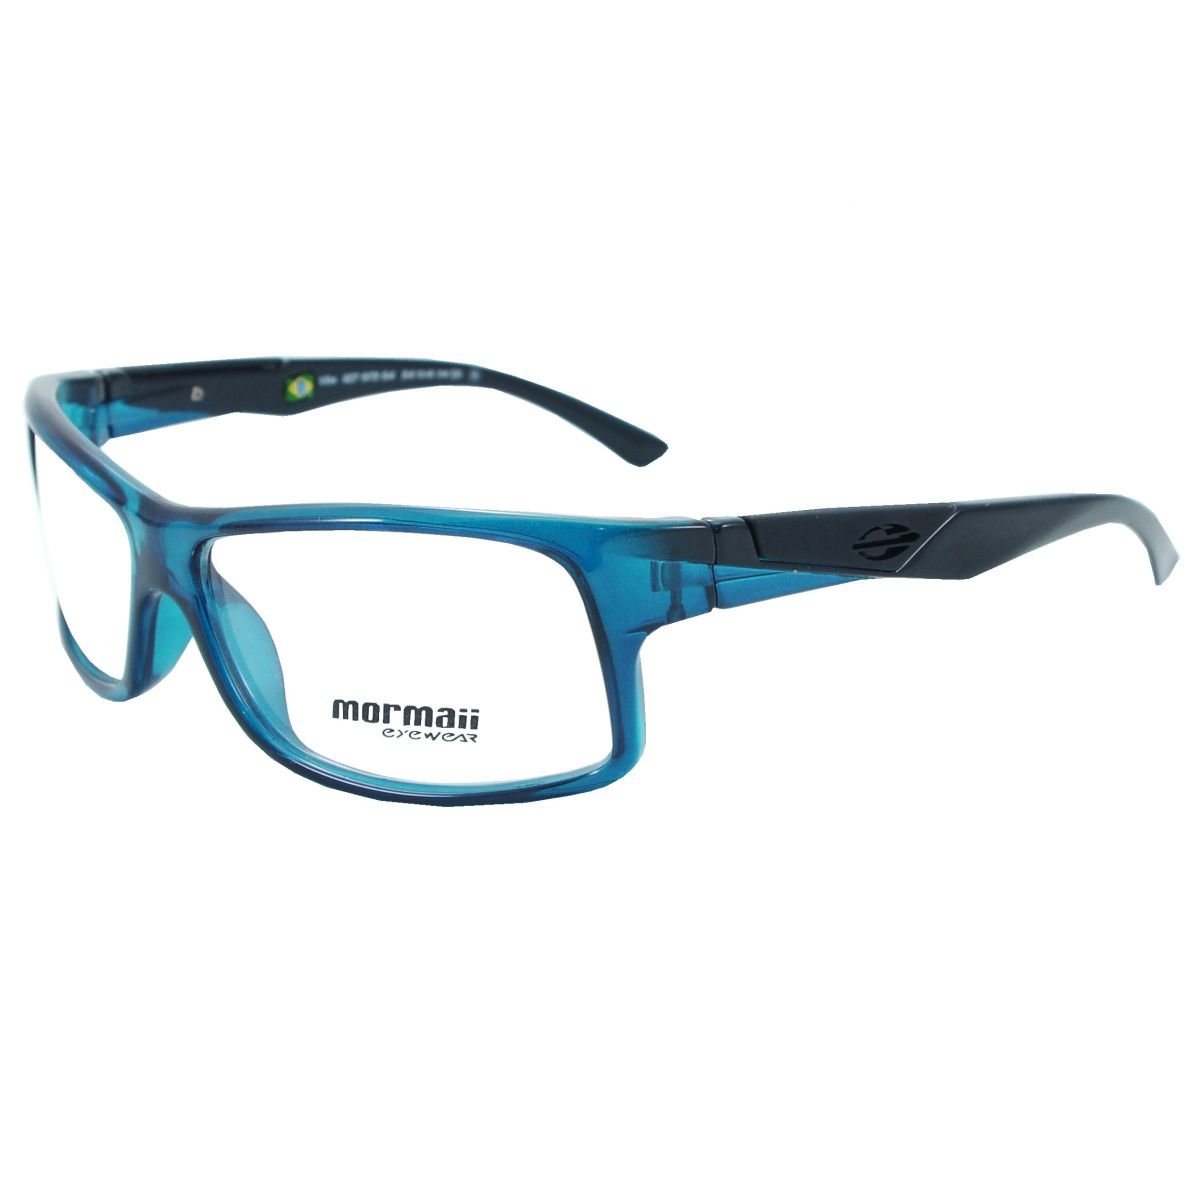 04c8c1393 Óculos De Grau Masculino Mormaii Vibe 1127 973 Tam ...